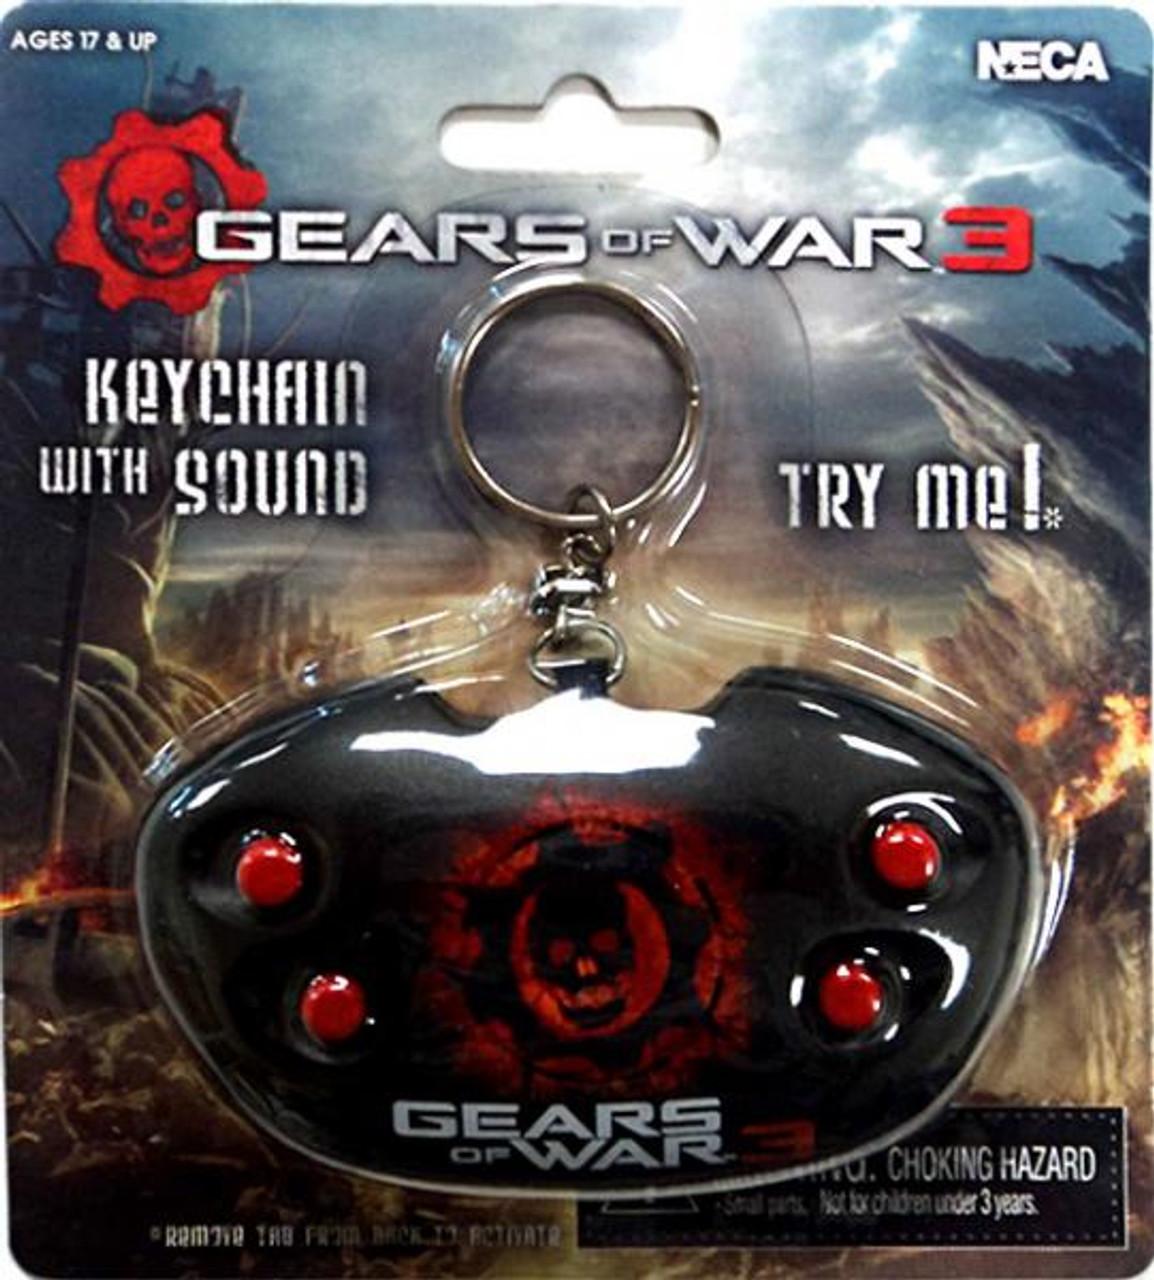 NECA Gears of War 3 Keychain [With Sound]